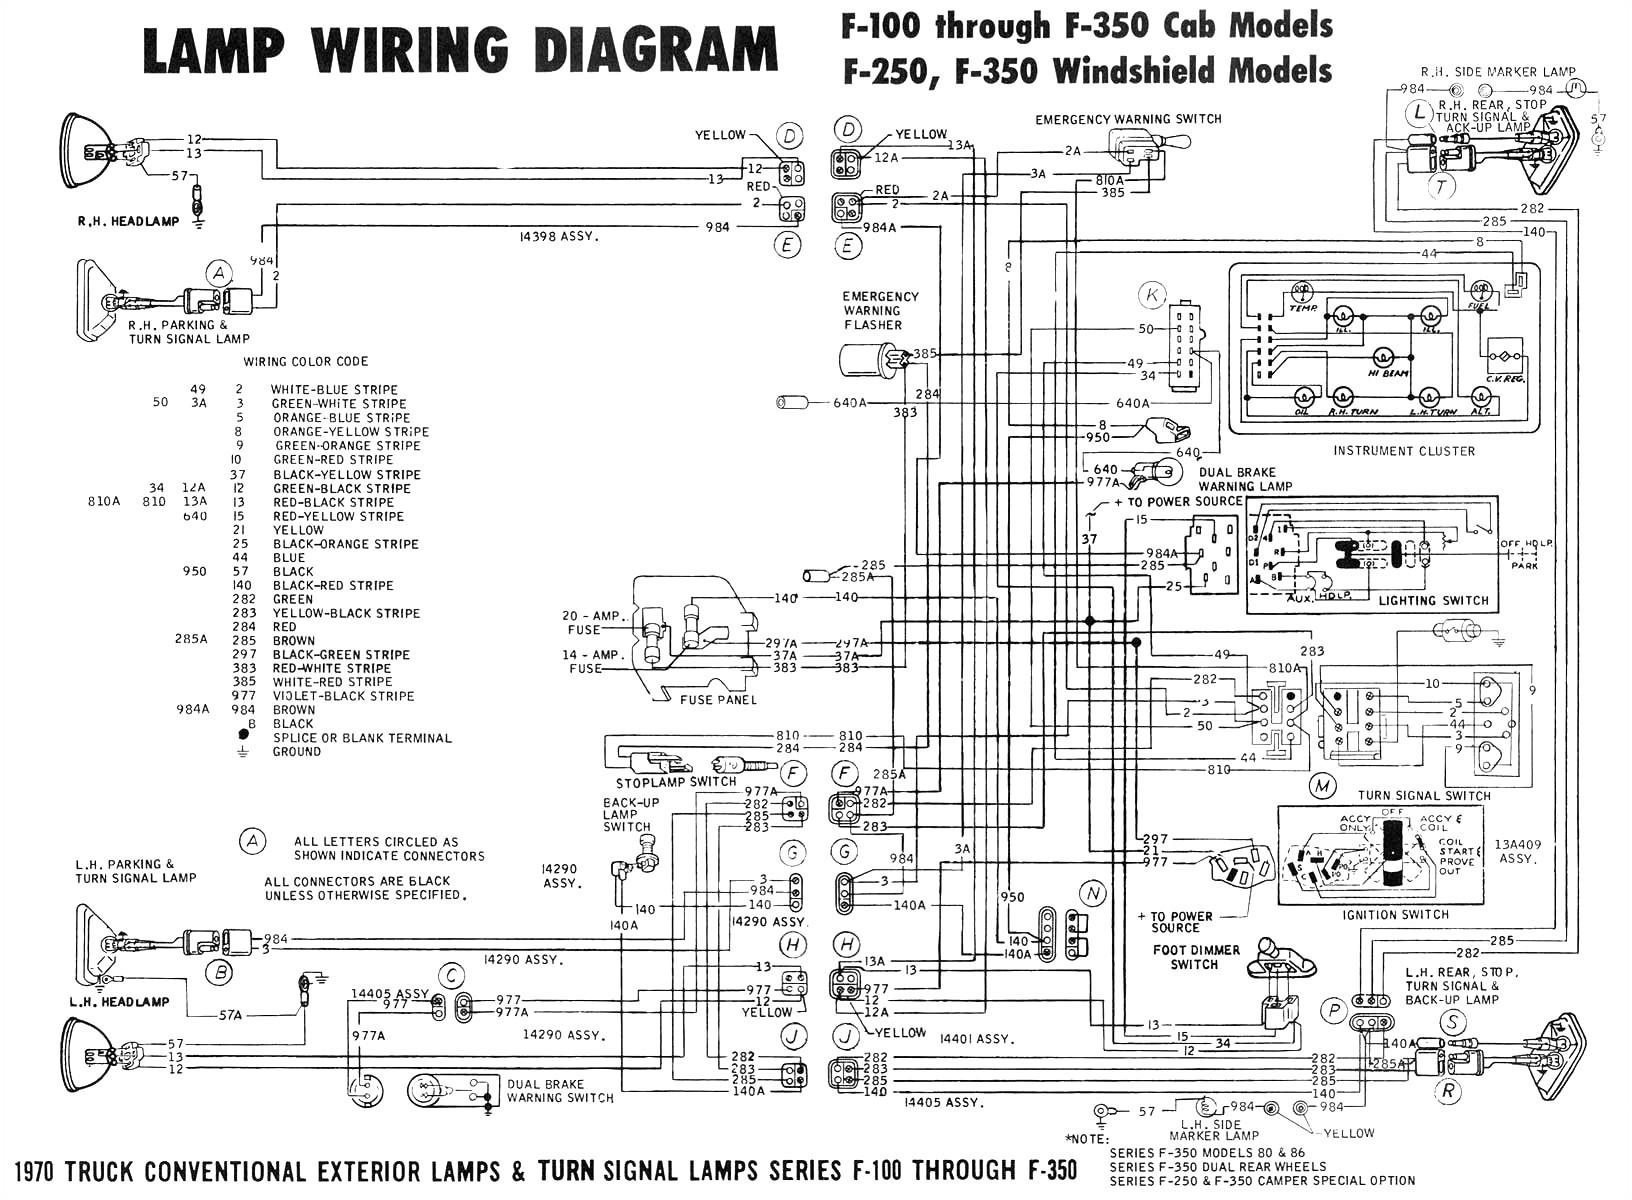 1994 f 350 engine diagram wiring diagram load 1994 ford f 150 engine diagram further 2005